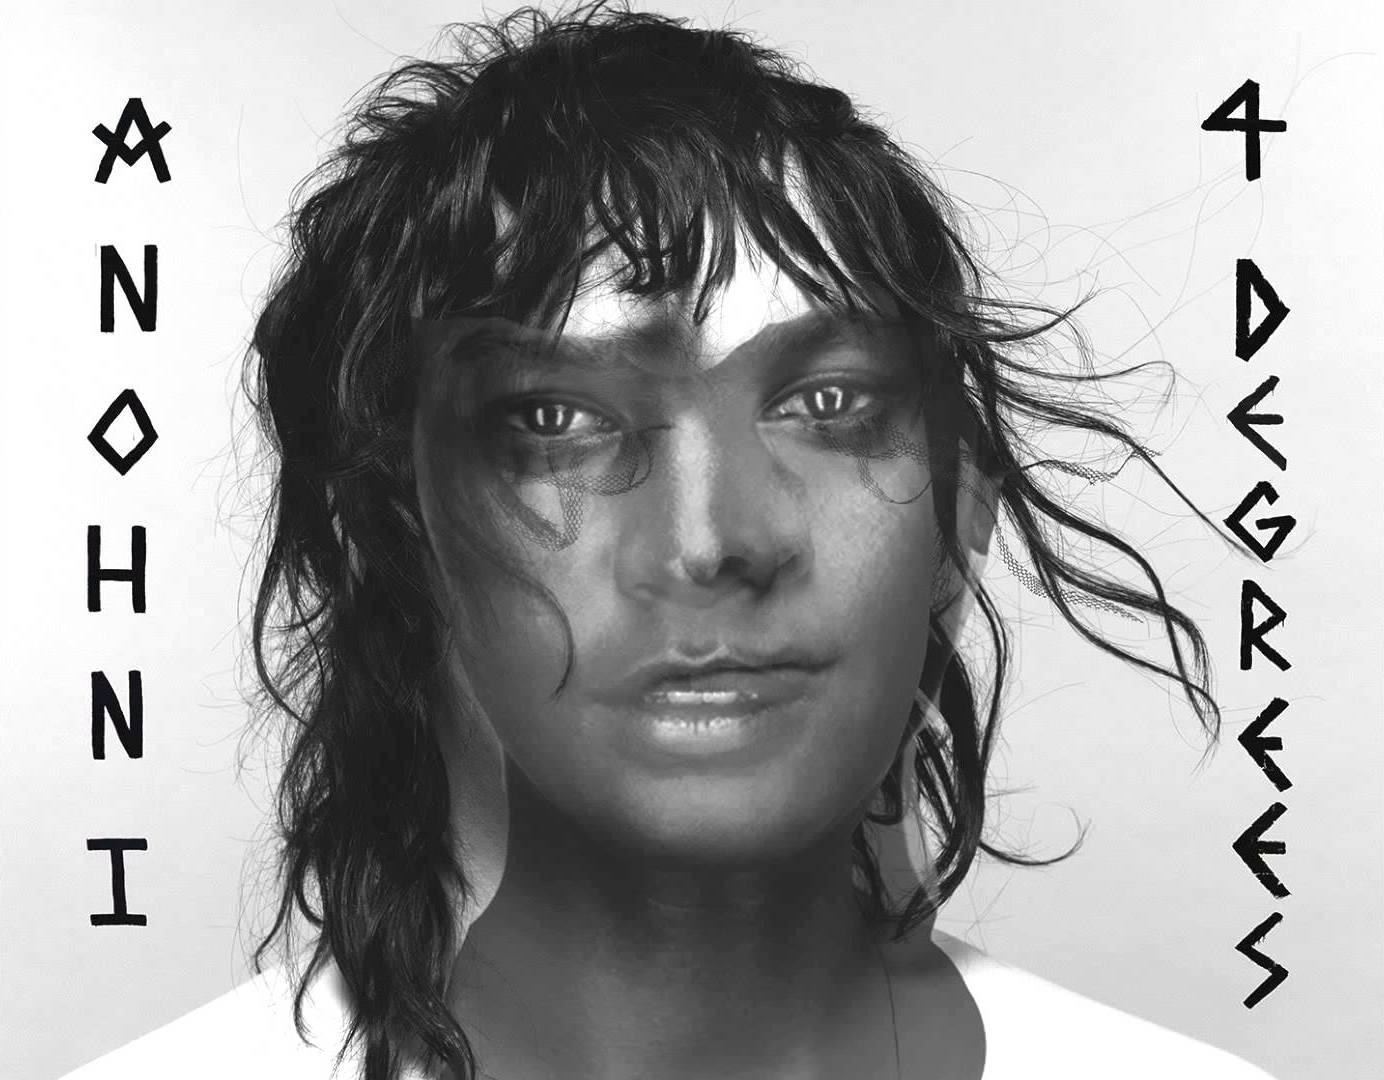 Anohni album review